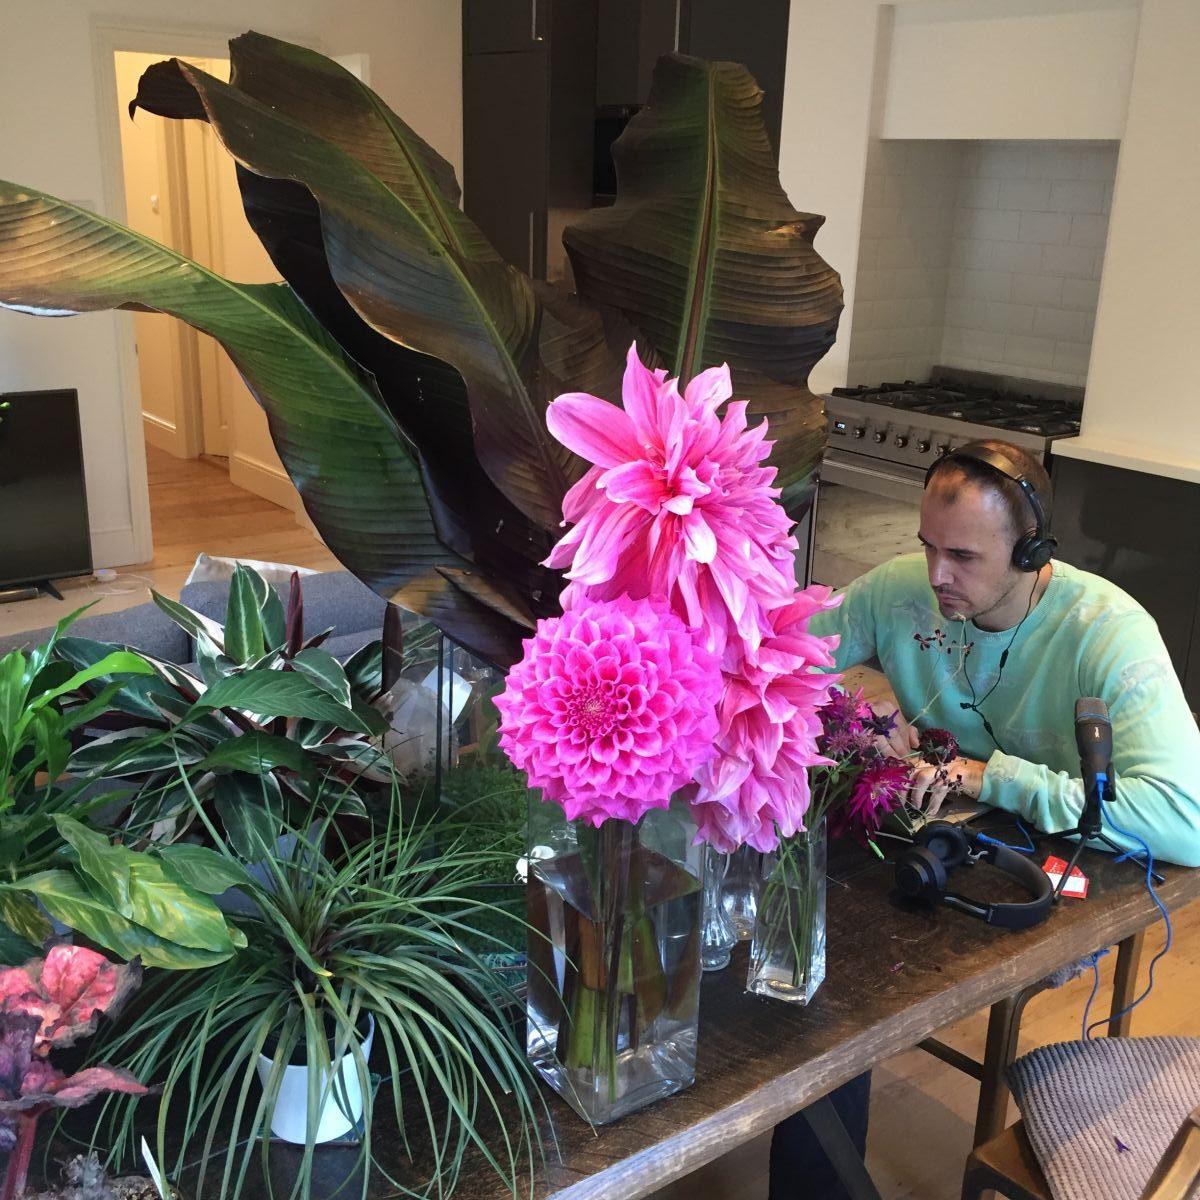 Dahlia, banana, indoor plants, cut flowers